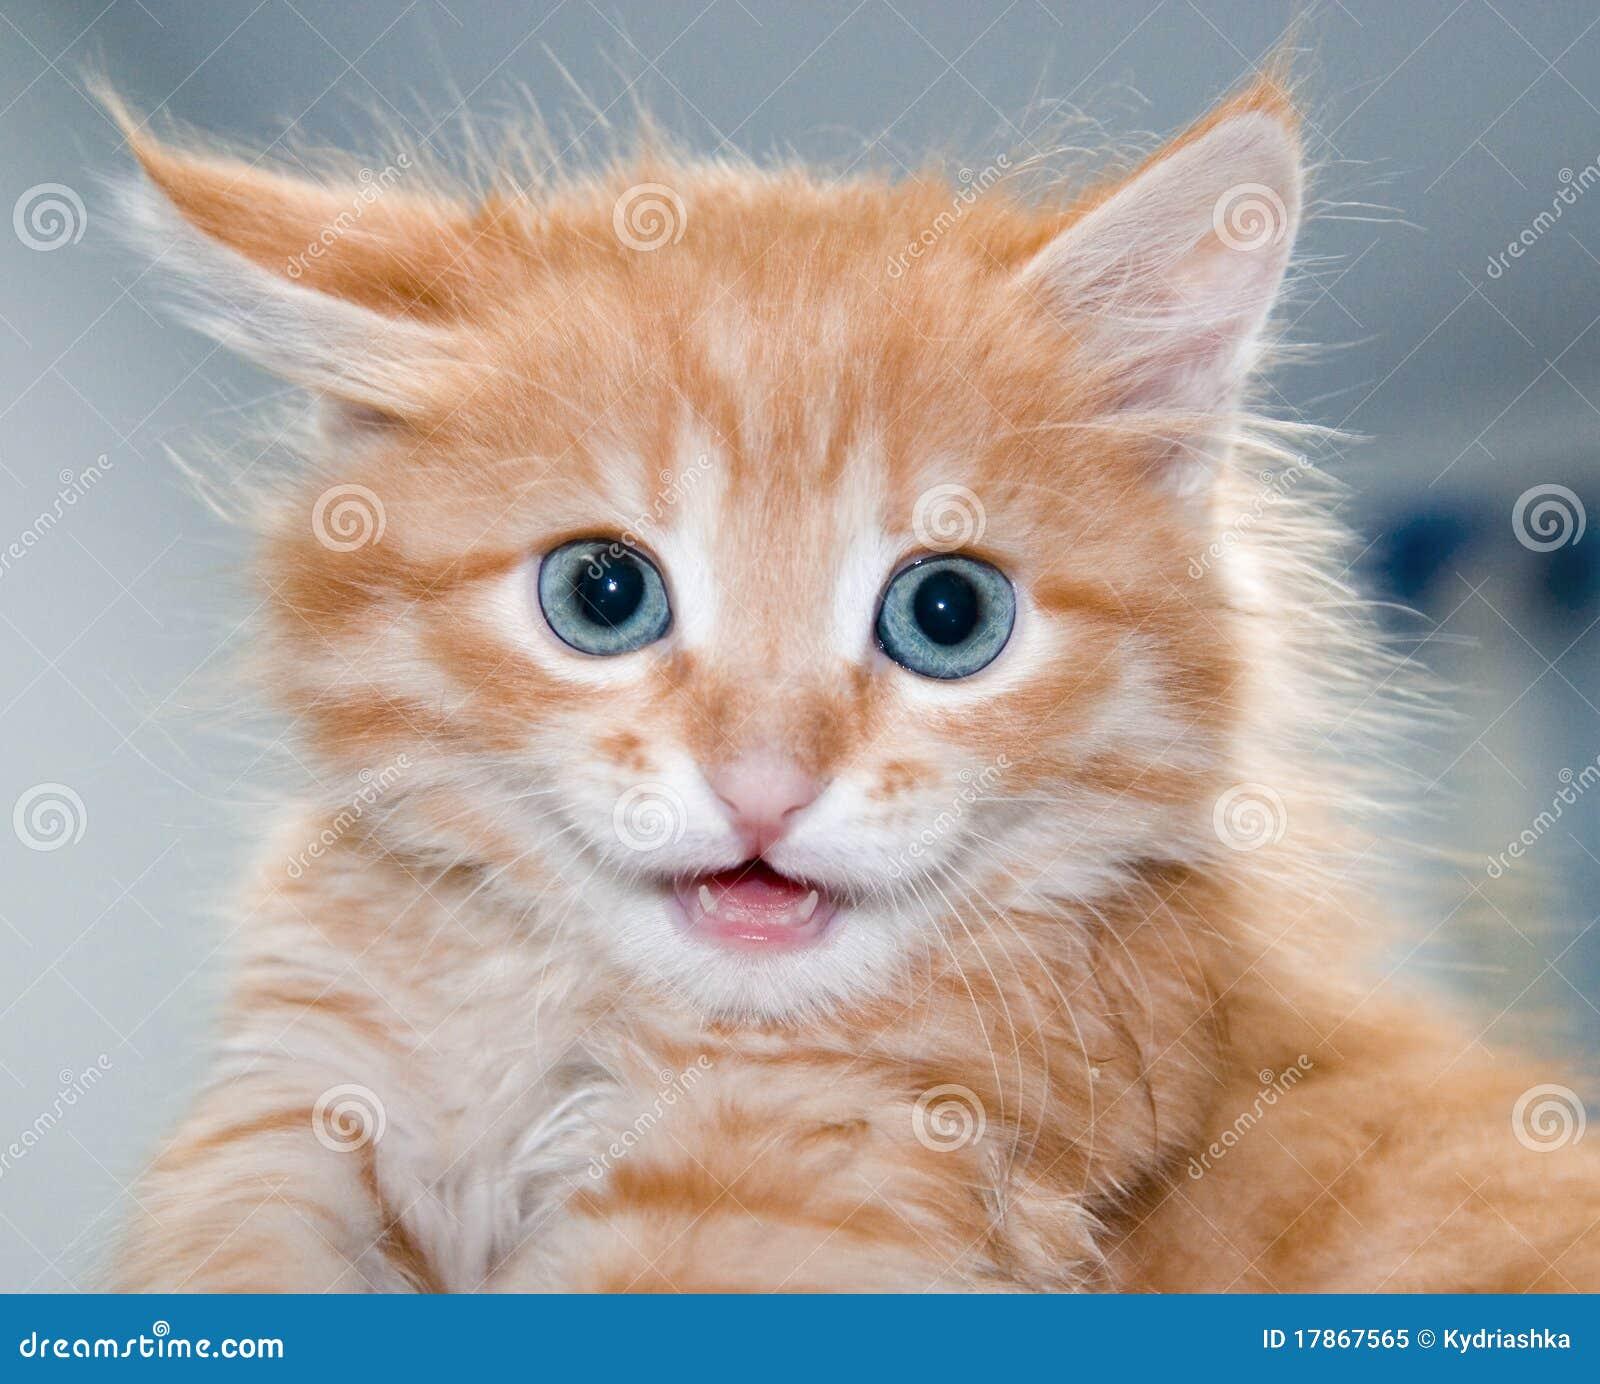 Cute Orange Kitten With Blue Eyes Royalty Free Stock Image